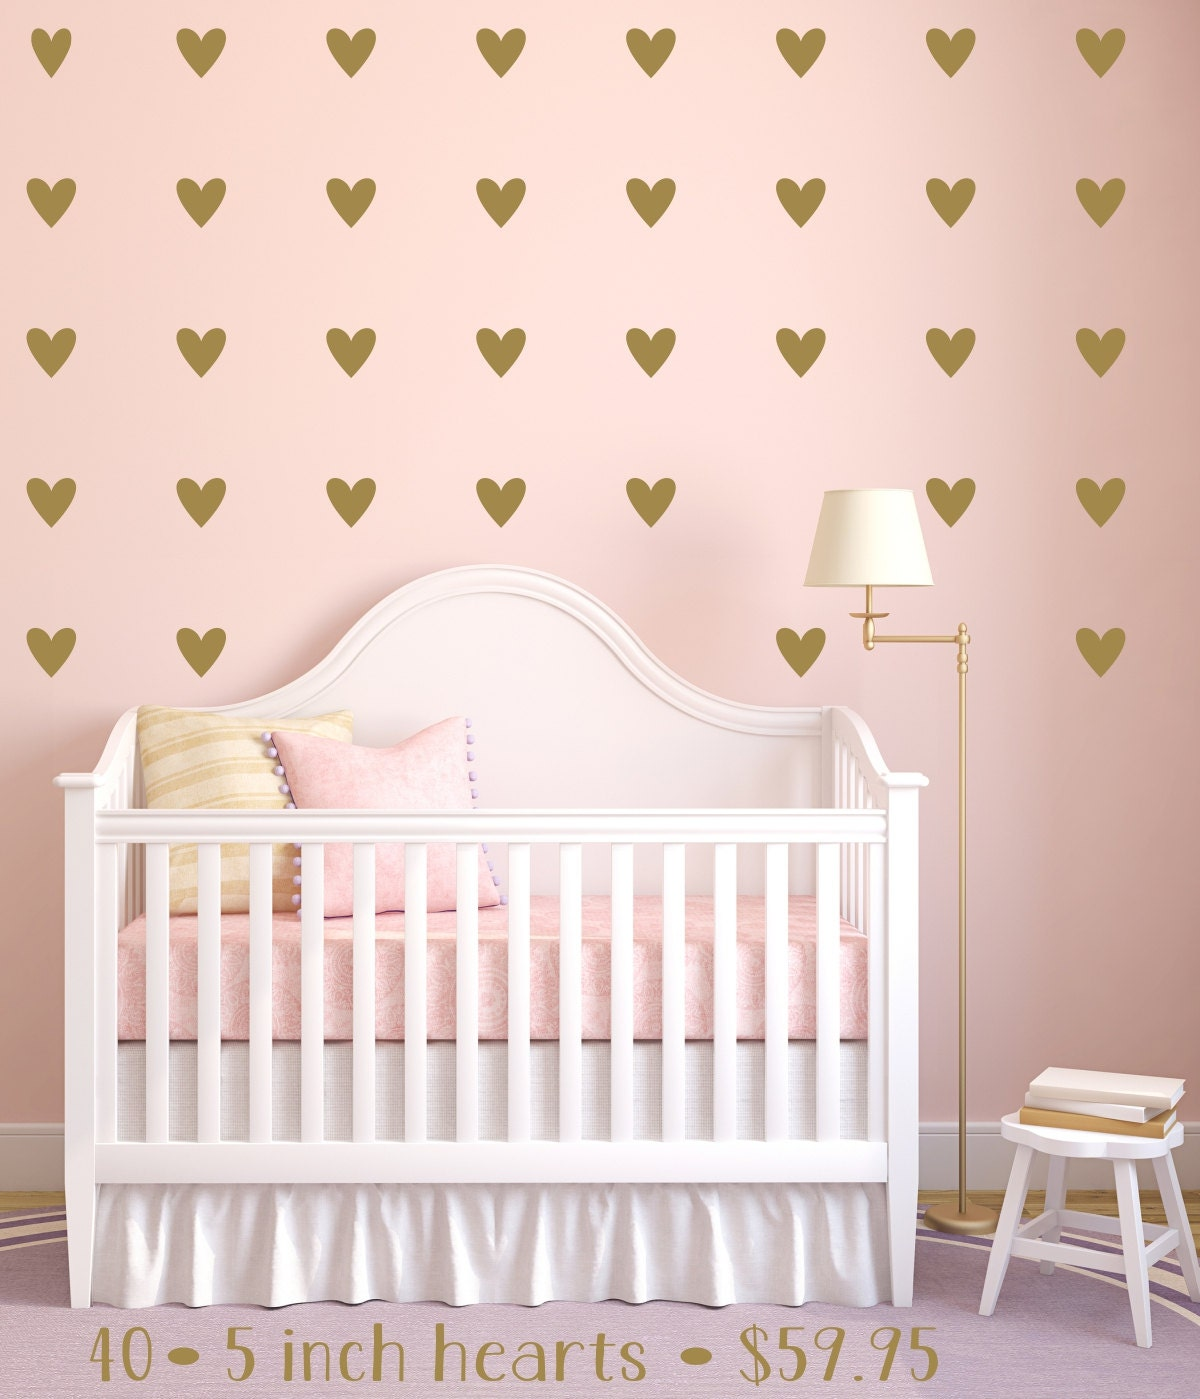 heart wall decals gold heart decals peel stick wall decals gallery photo gallery photo gallery photo